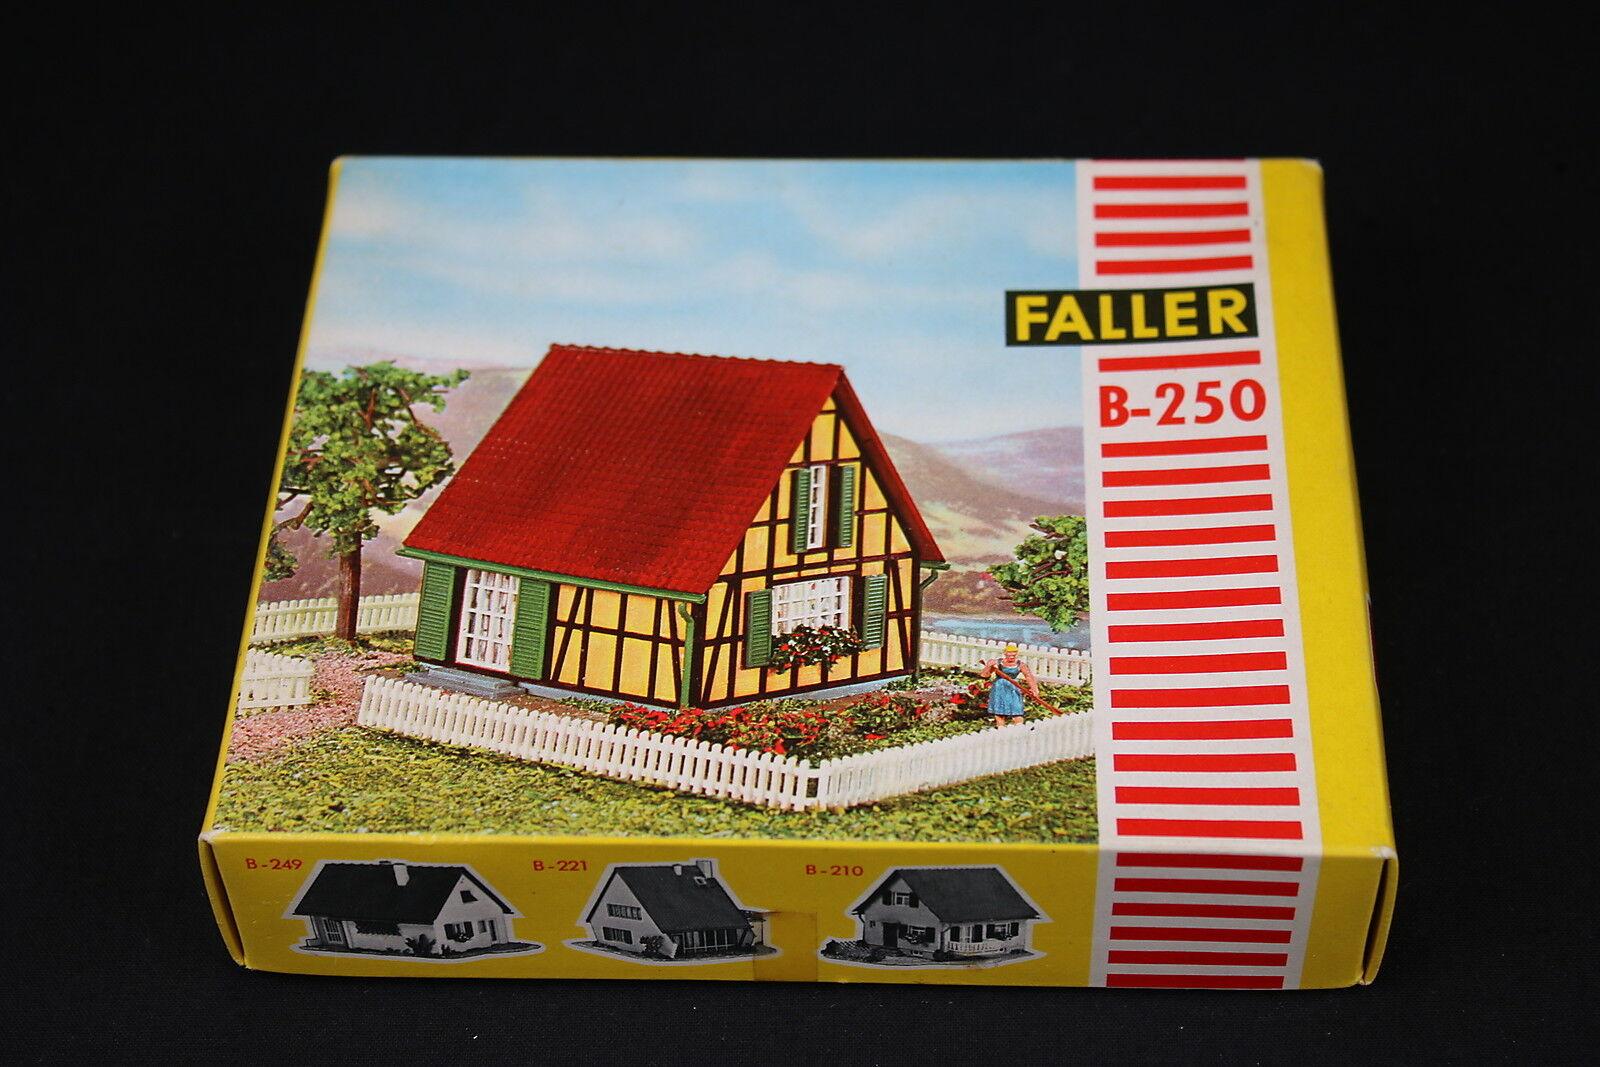 W002 FtuttiER Train Maquette B250 Maison paysanne frame house Frackwerkhaus